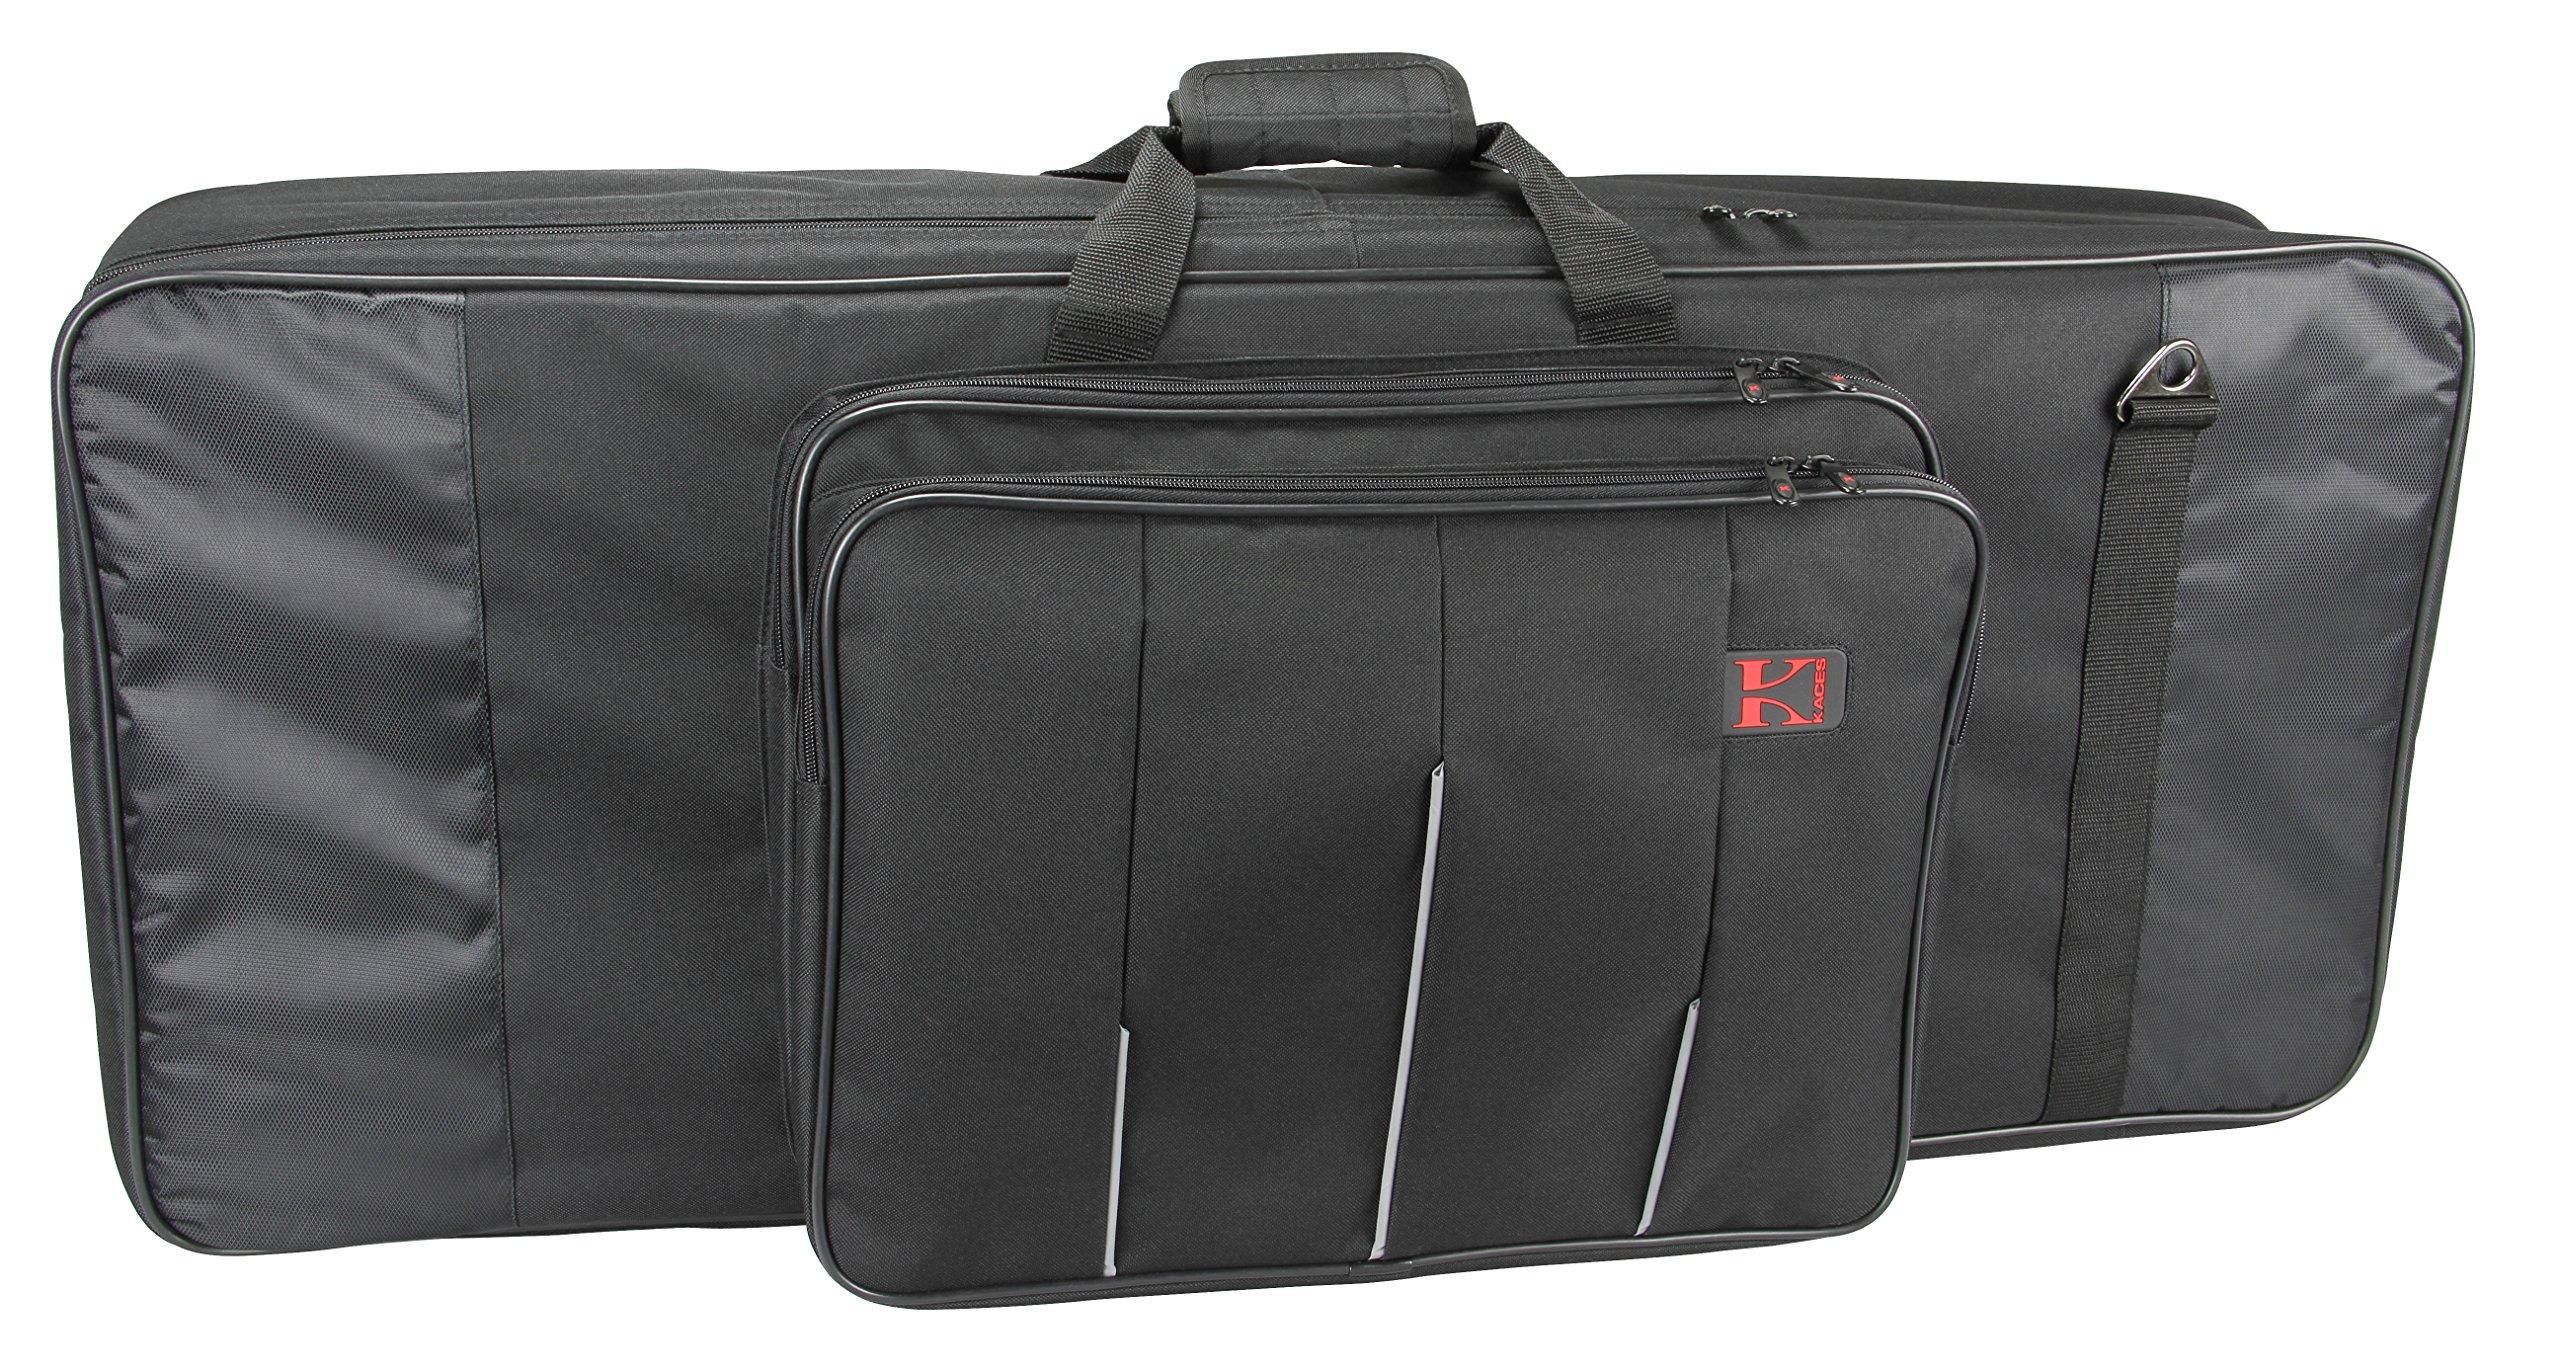 Kaces 6-KB Xpress Series Keyboard Bag, 61-Key, small (37'' x 15'' x 6.5'')